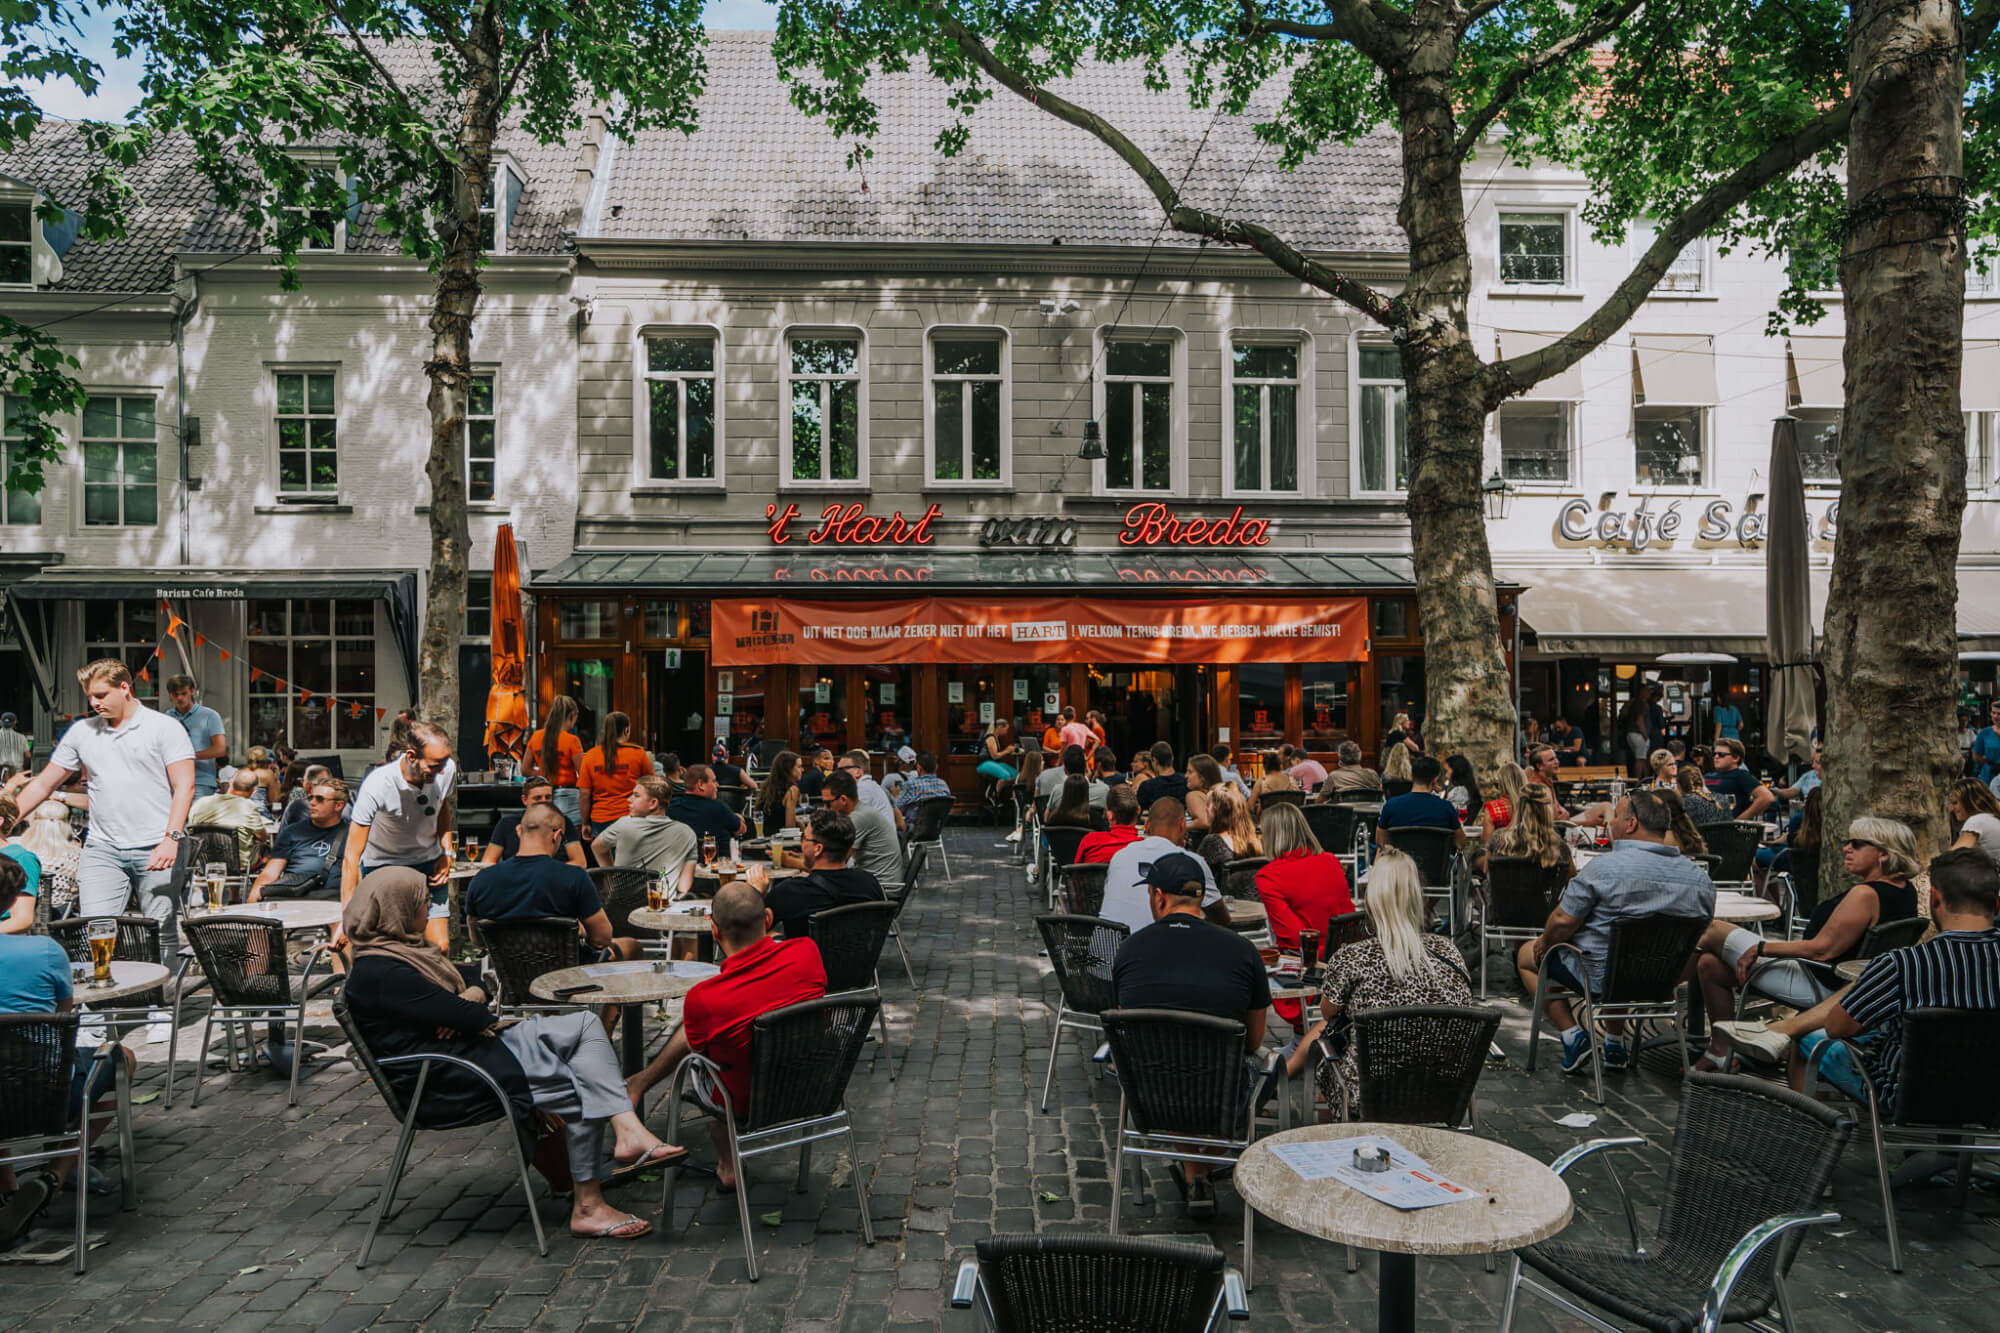 Binnenstad van Breda